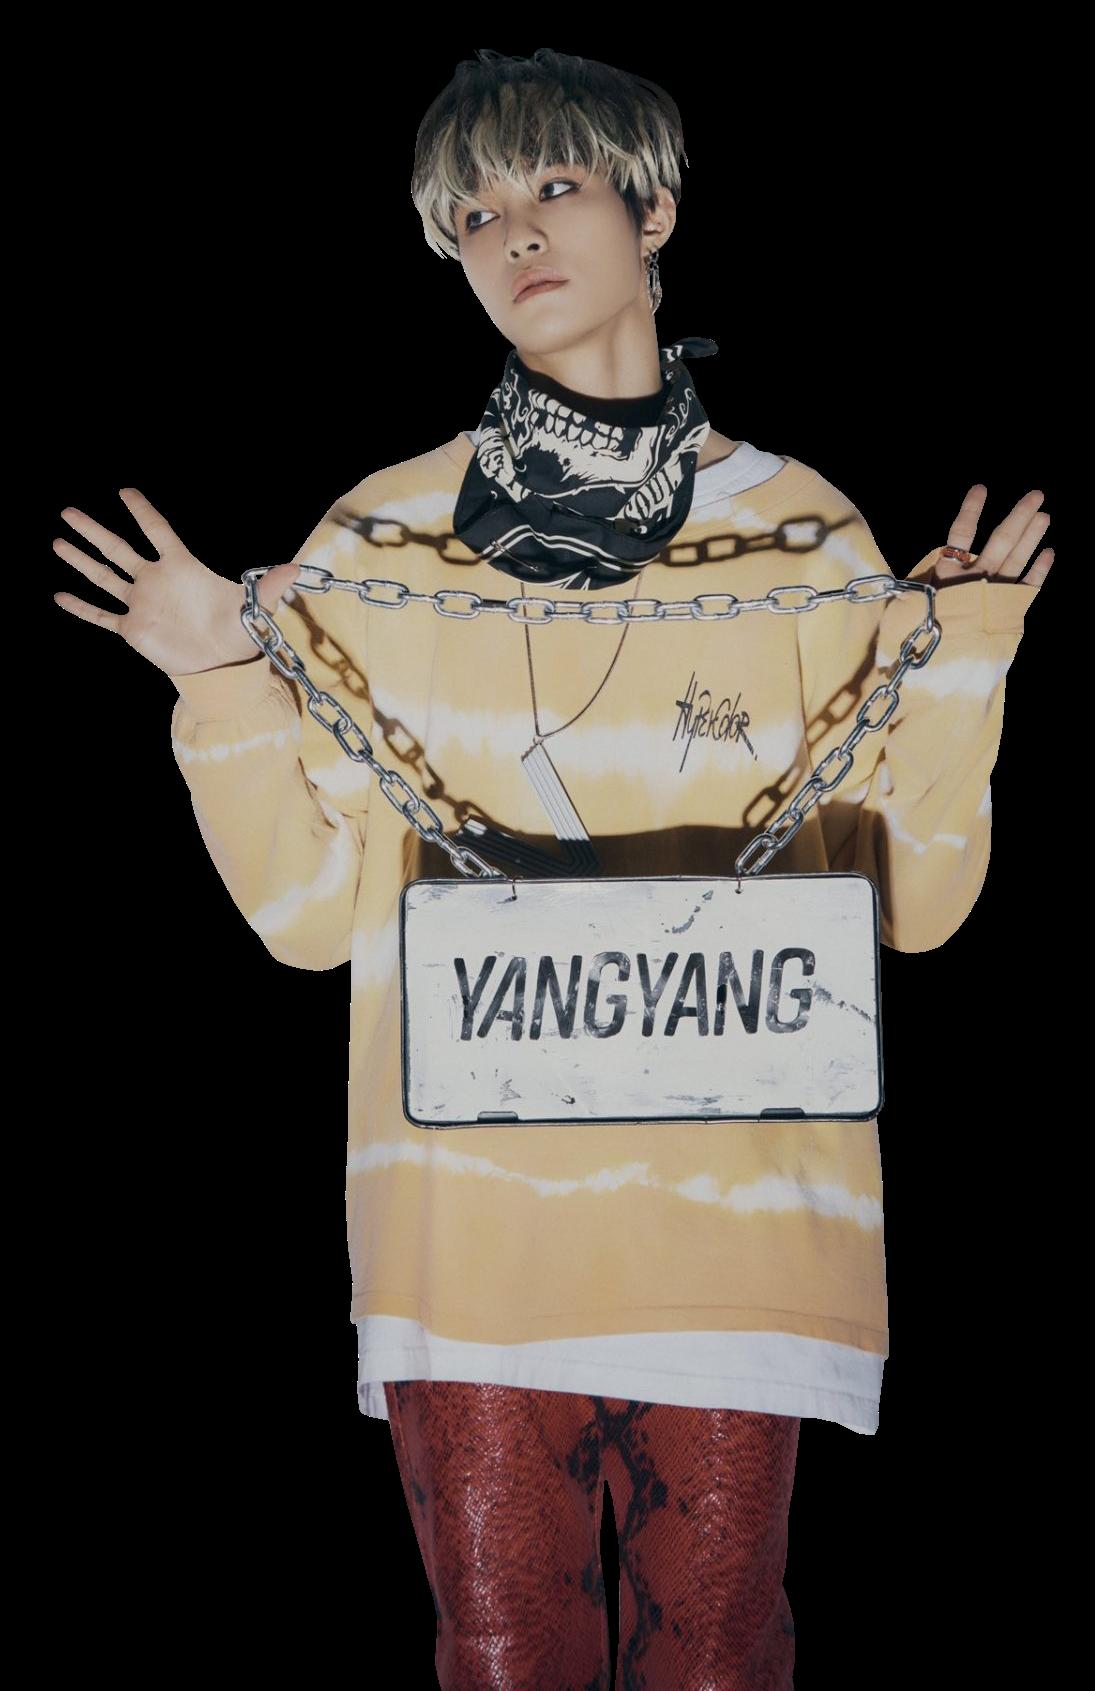 Nct Yangyang Liuyangyang Sticker By B Day 18th July